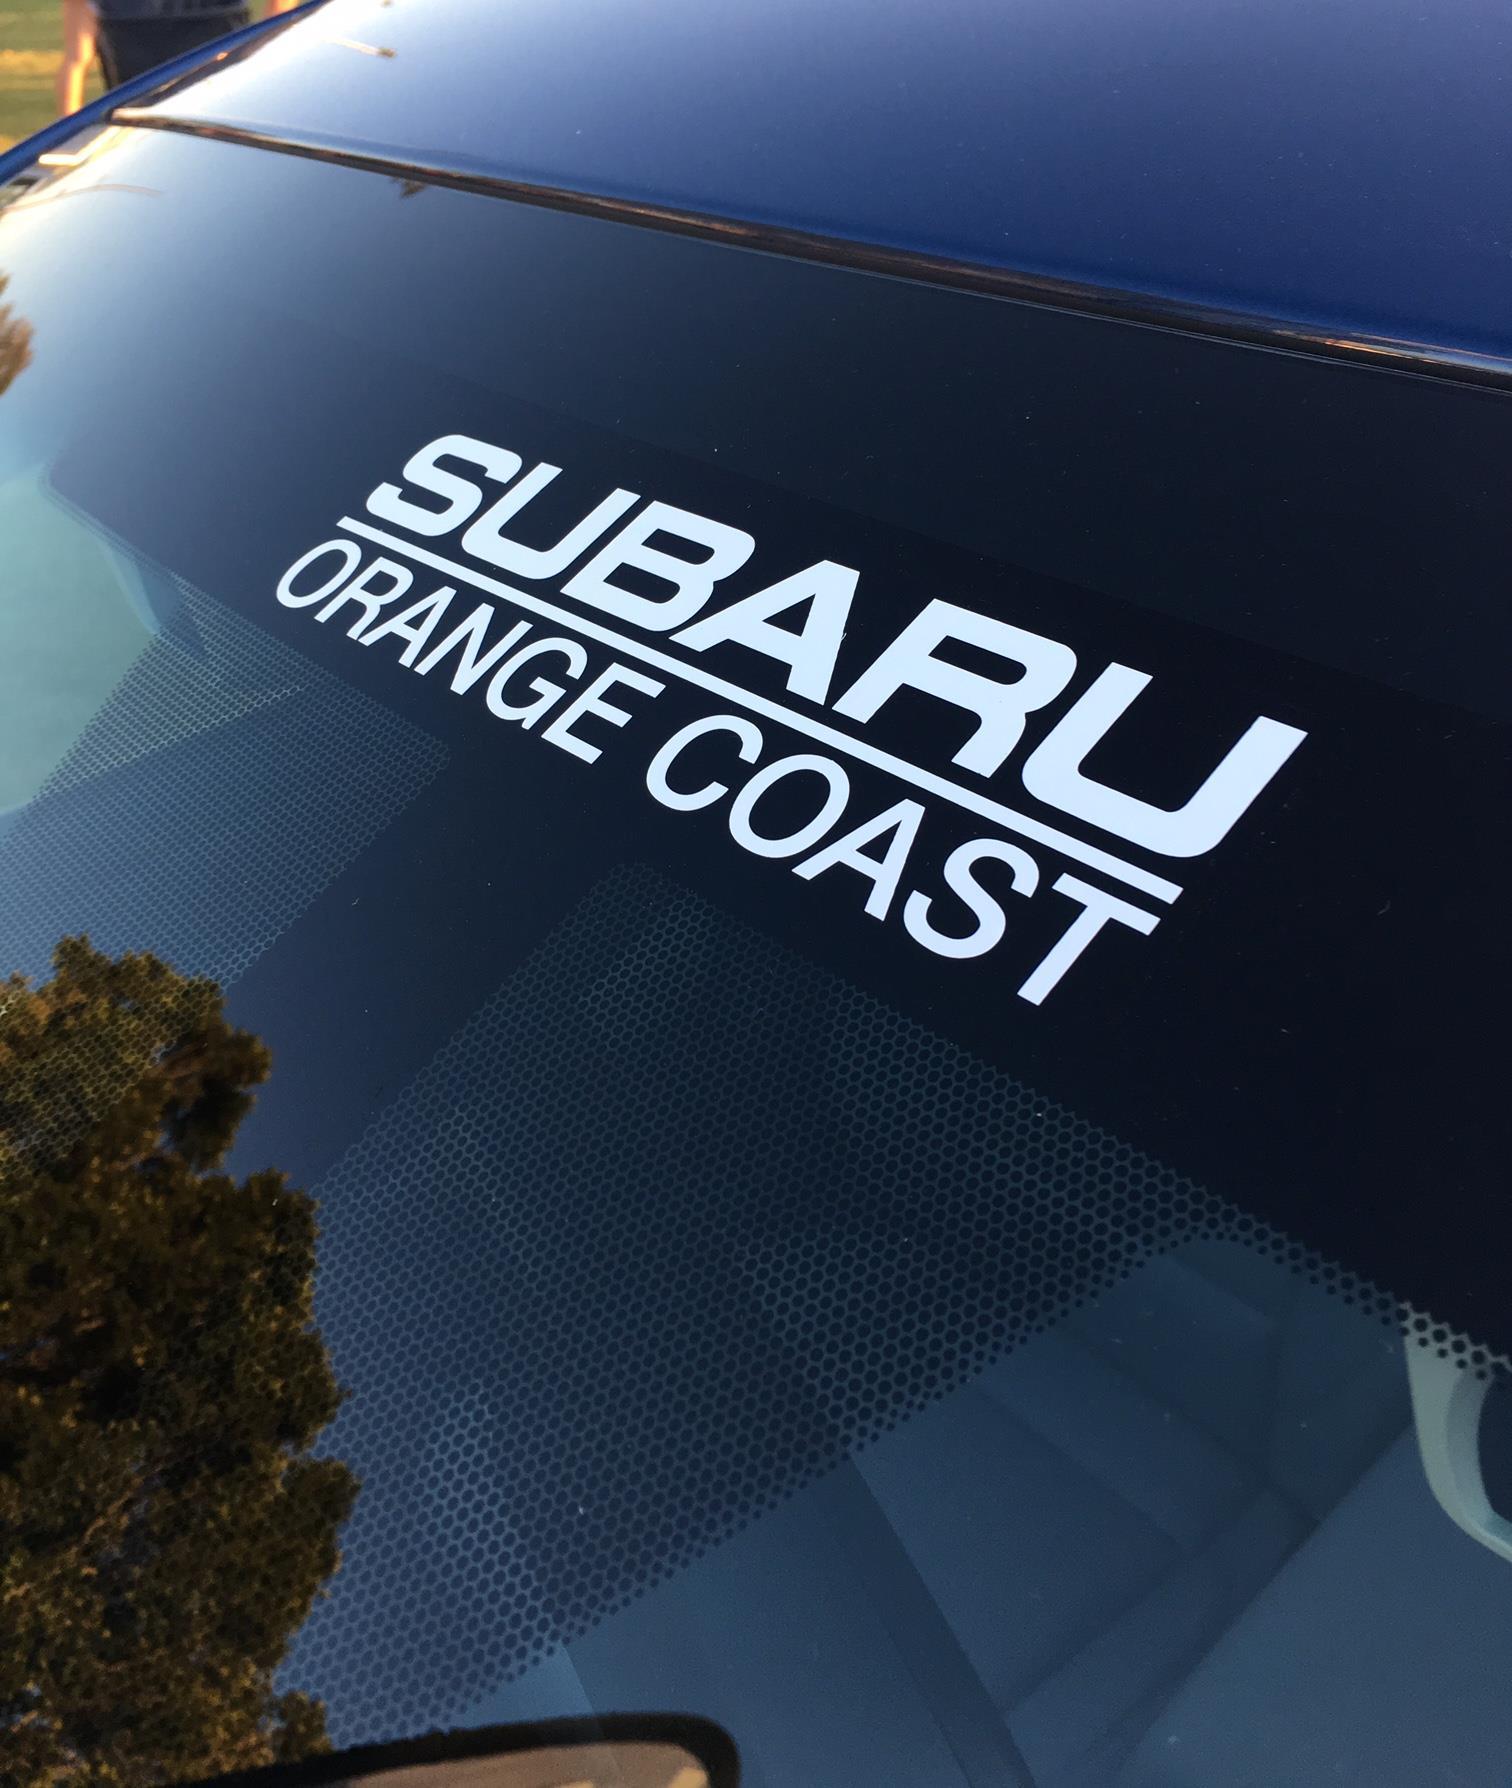 Used Volvo Orange County: Subaru Orange Coast In Santa Ana, CA